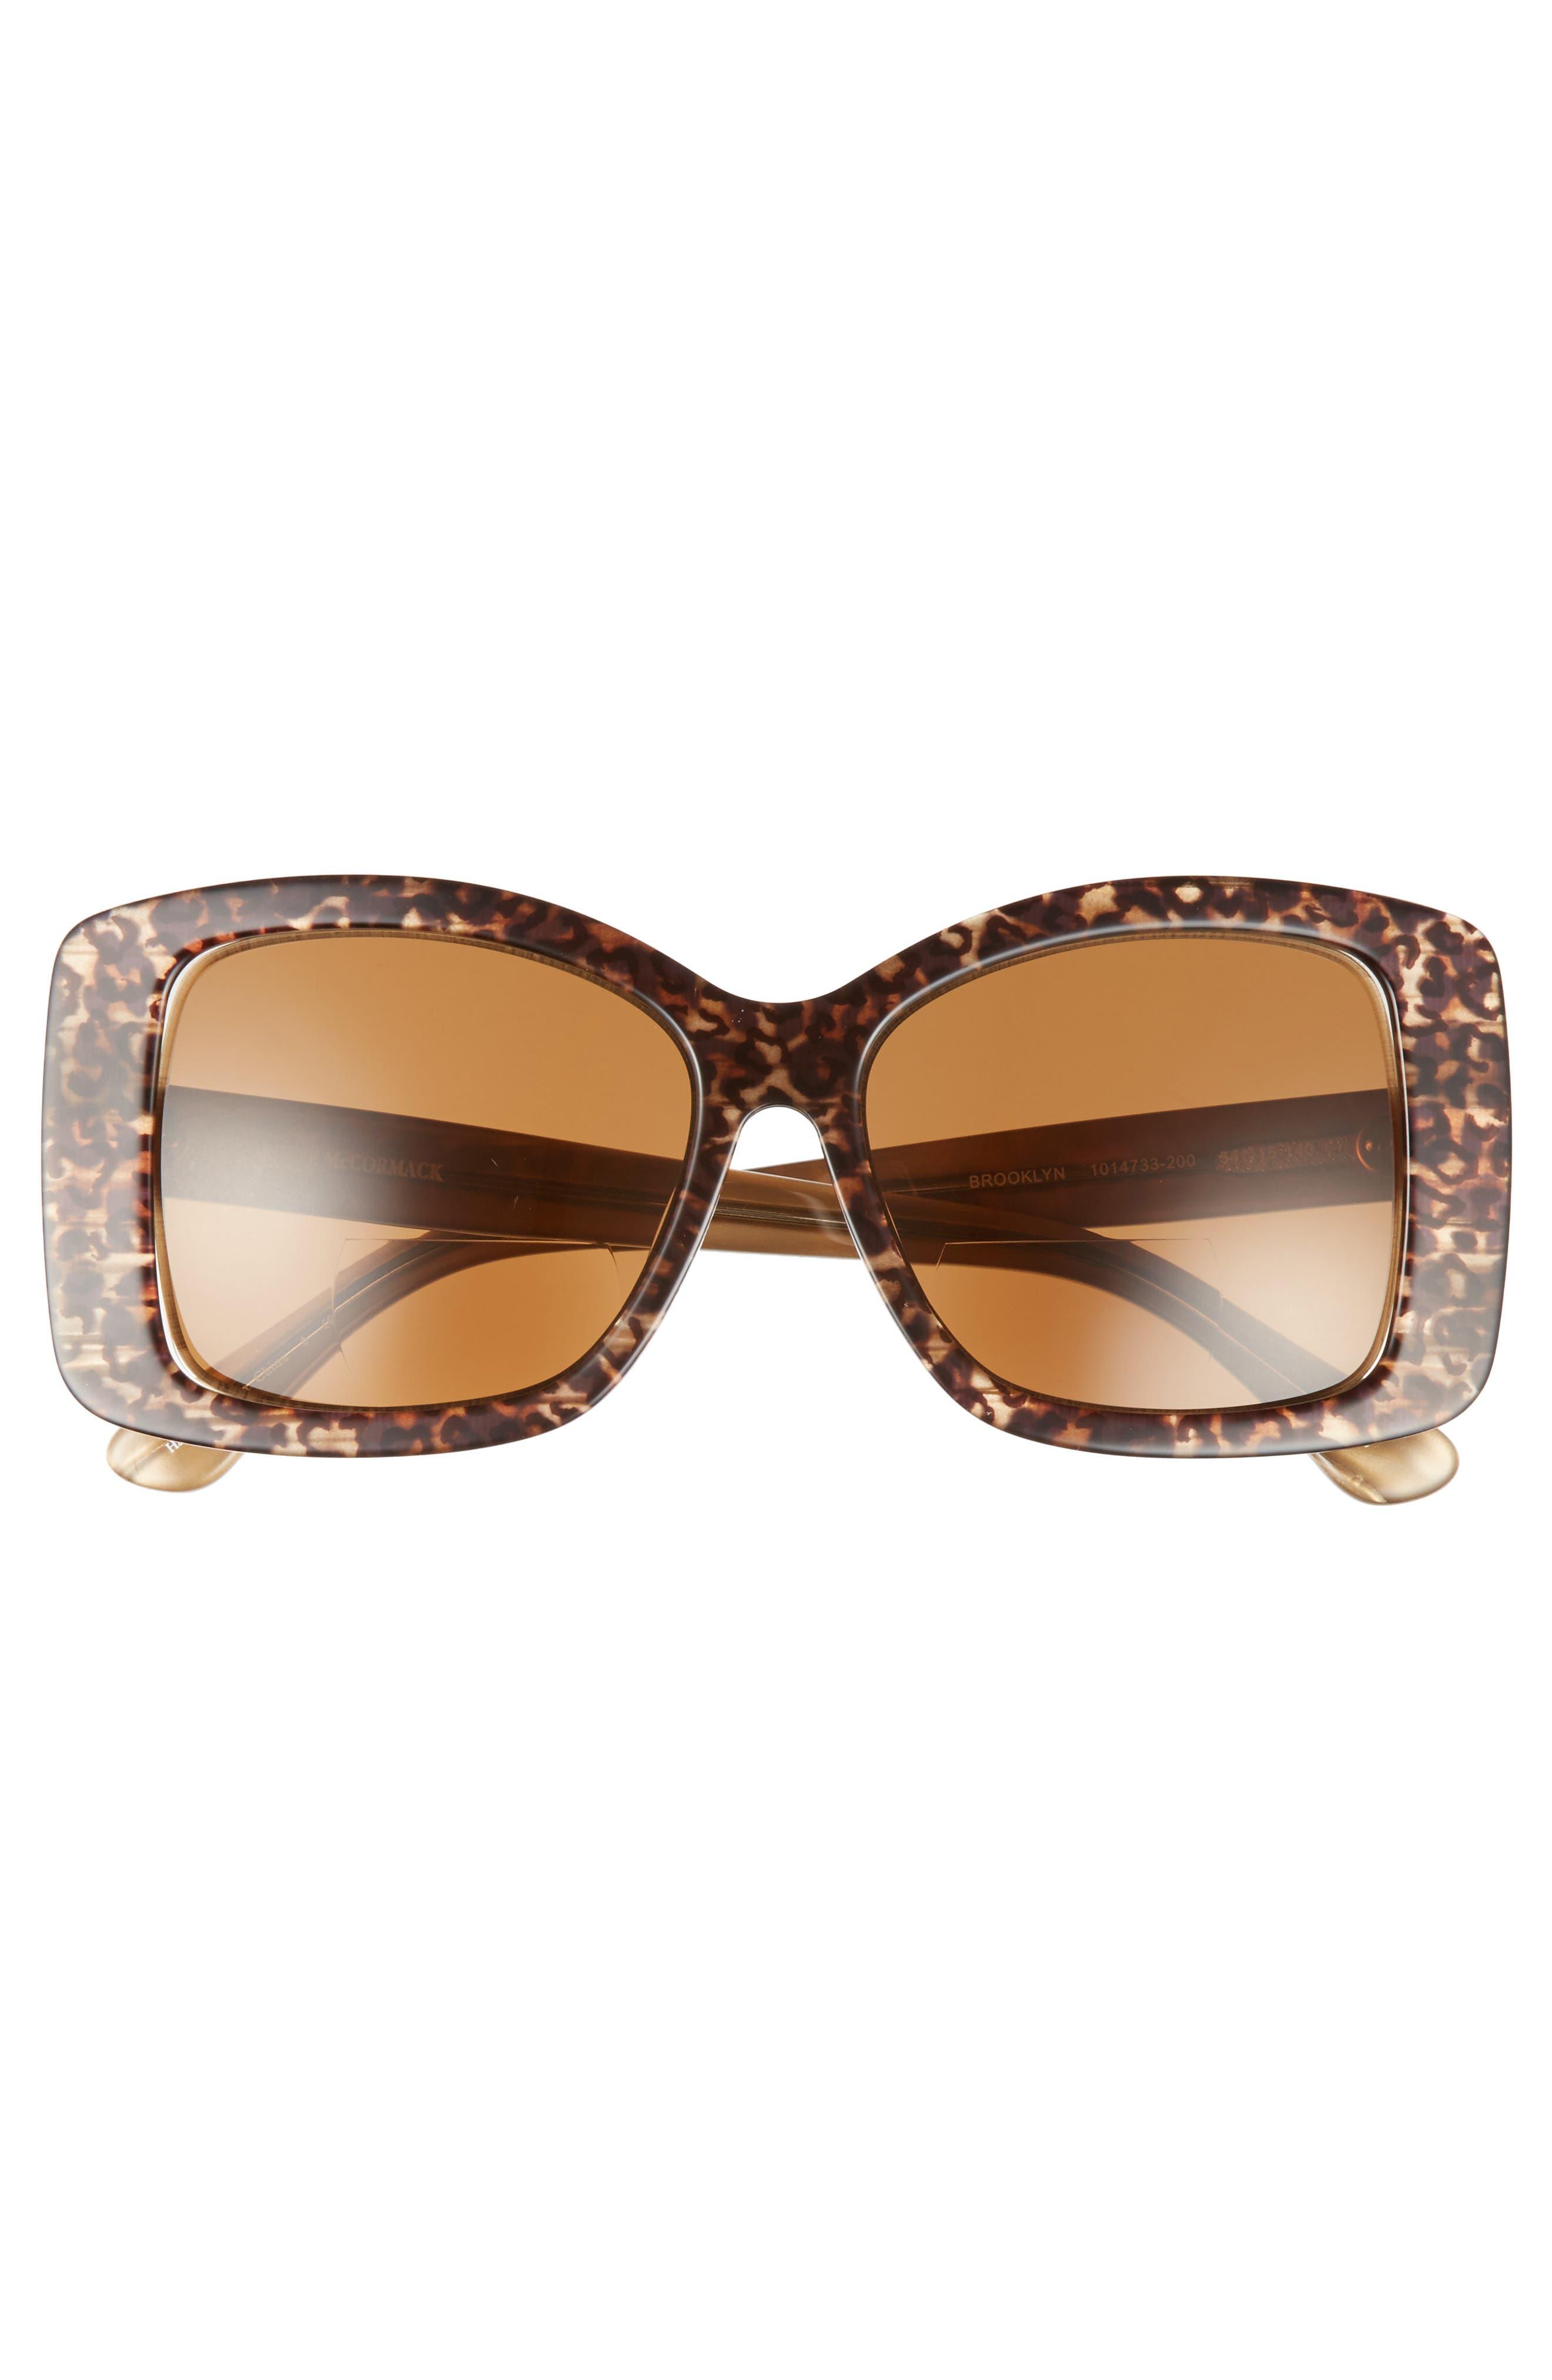 Brooklyn 54mm Reading Sunglasses,                             Alternate thumbnail 3, color,                             Brown